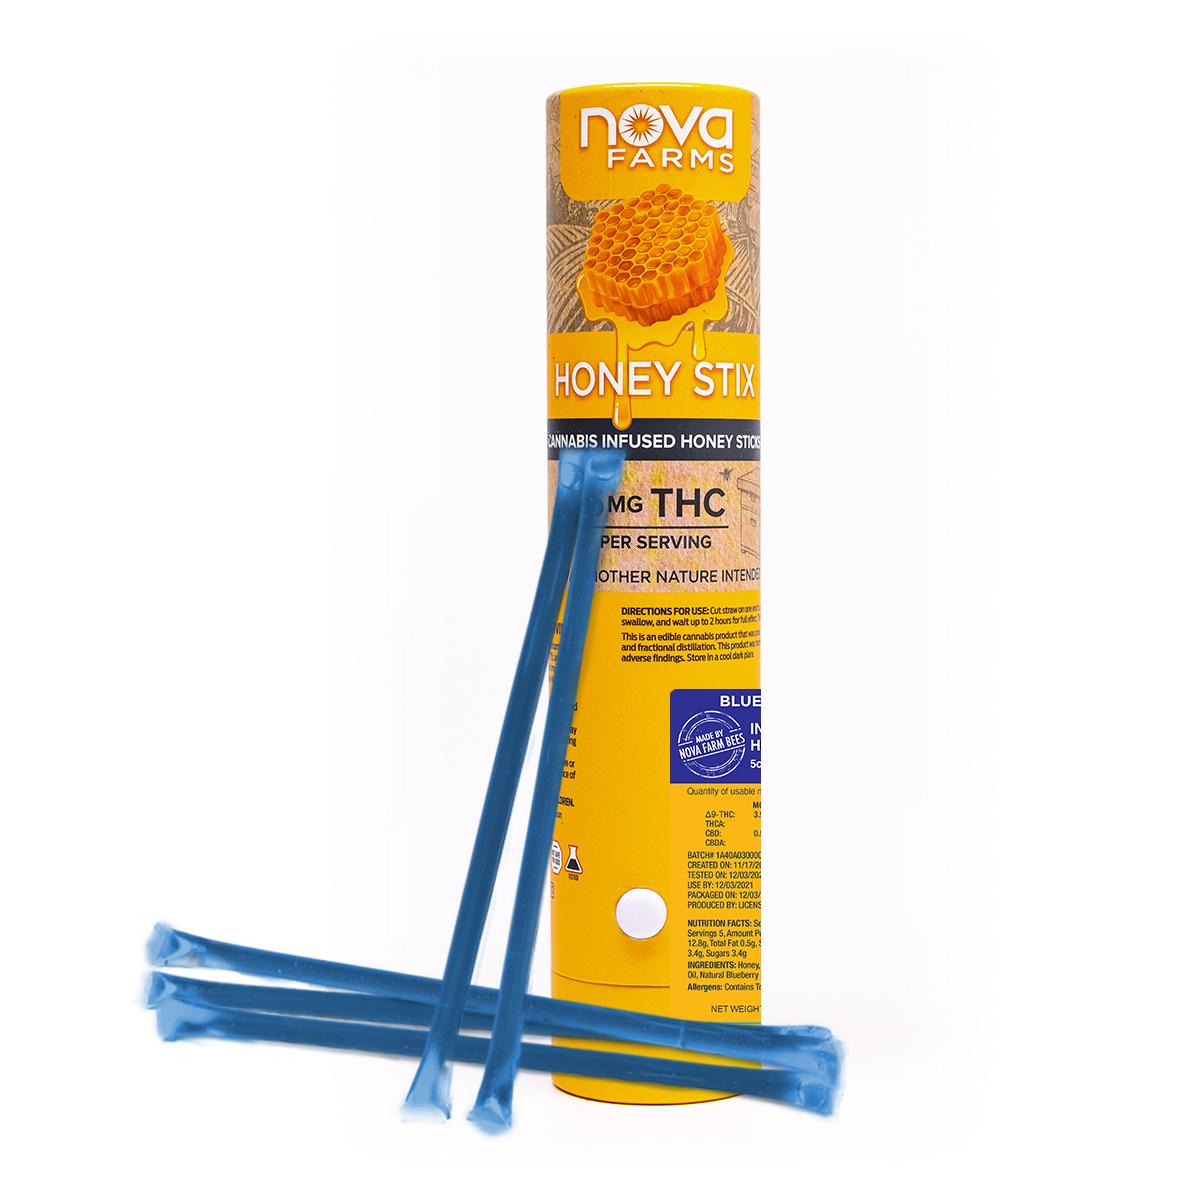 Nova Farms Honey Sticks 5pk (25mg) Blueberry (Recreational use)